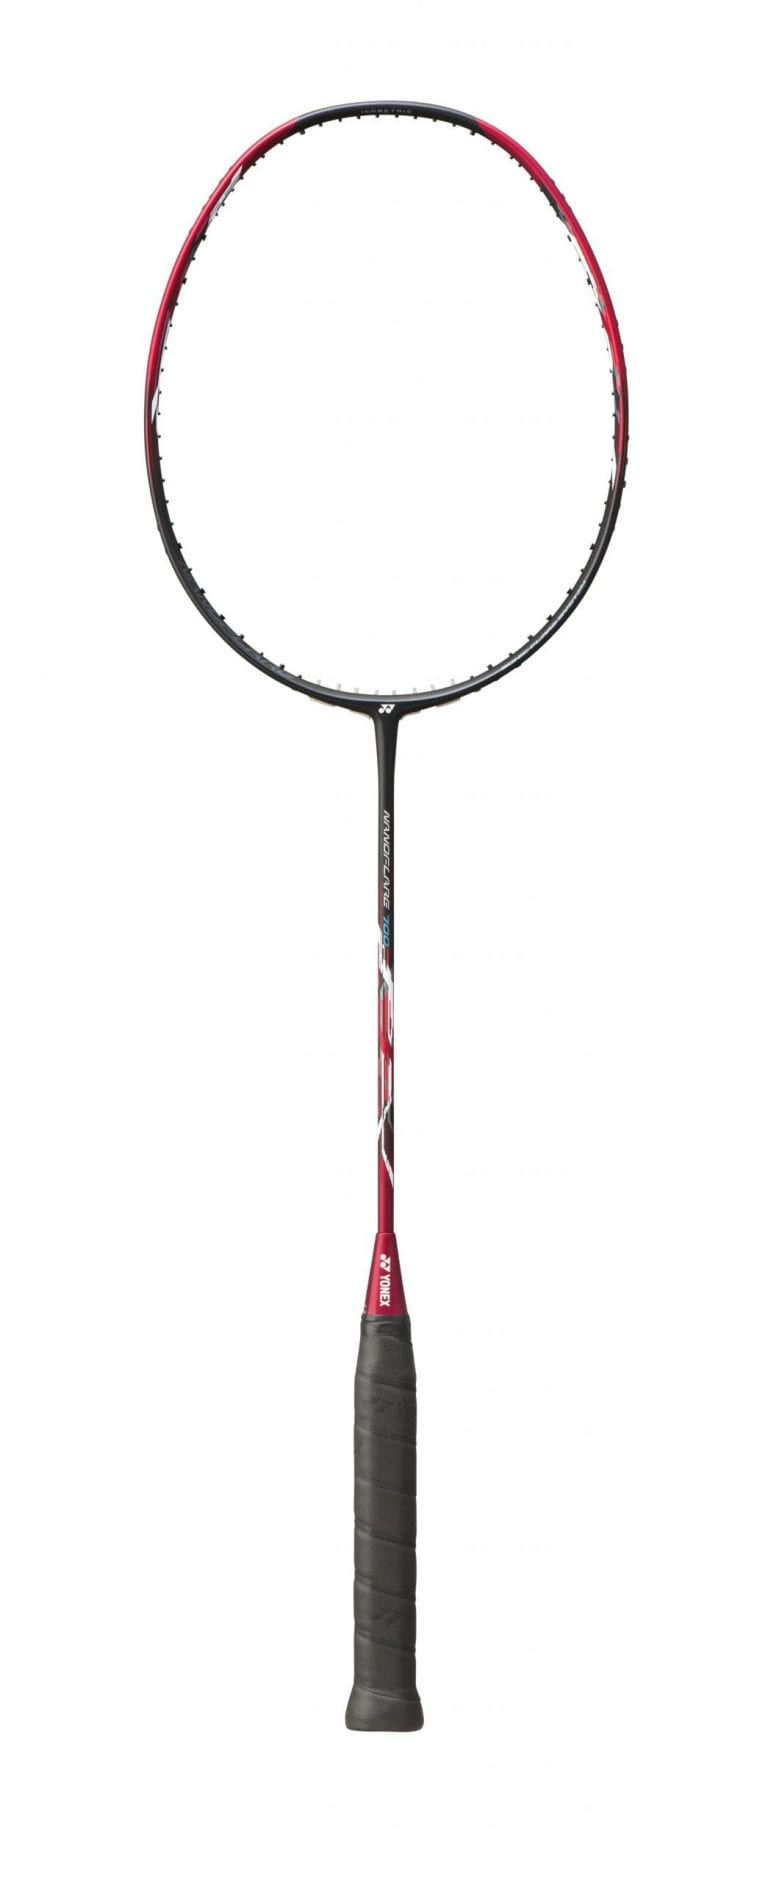 Yonex Badmintonracket Nanoflare 700